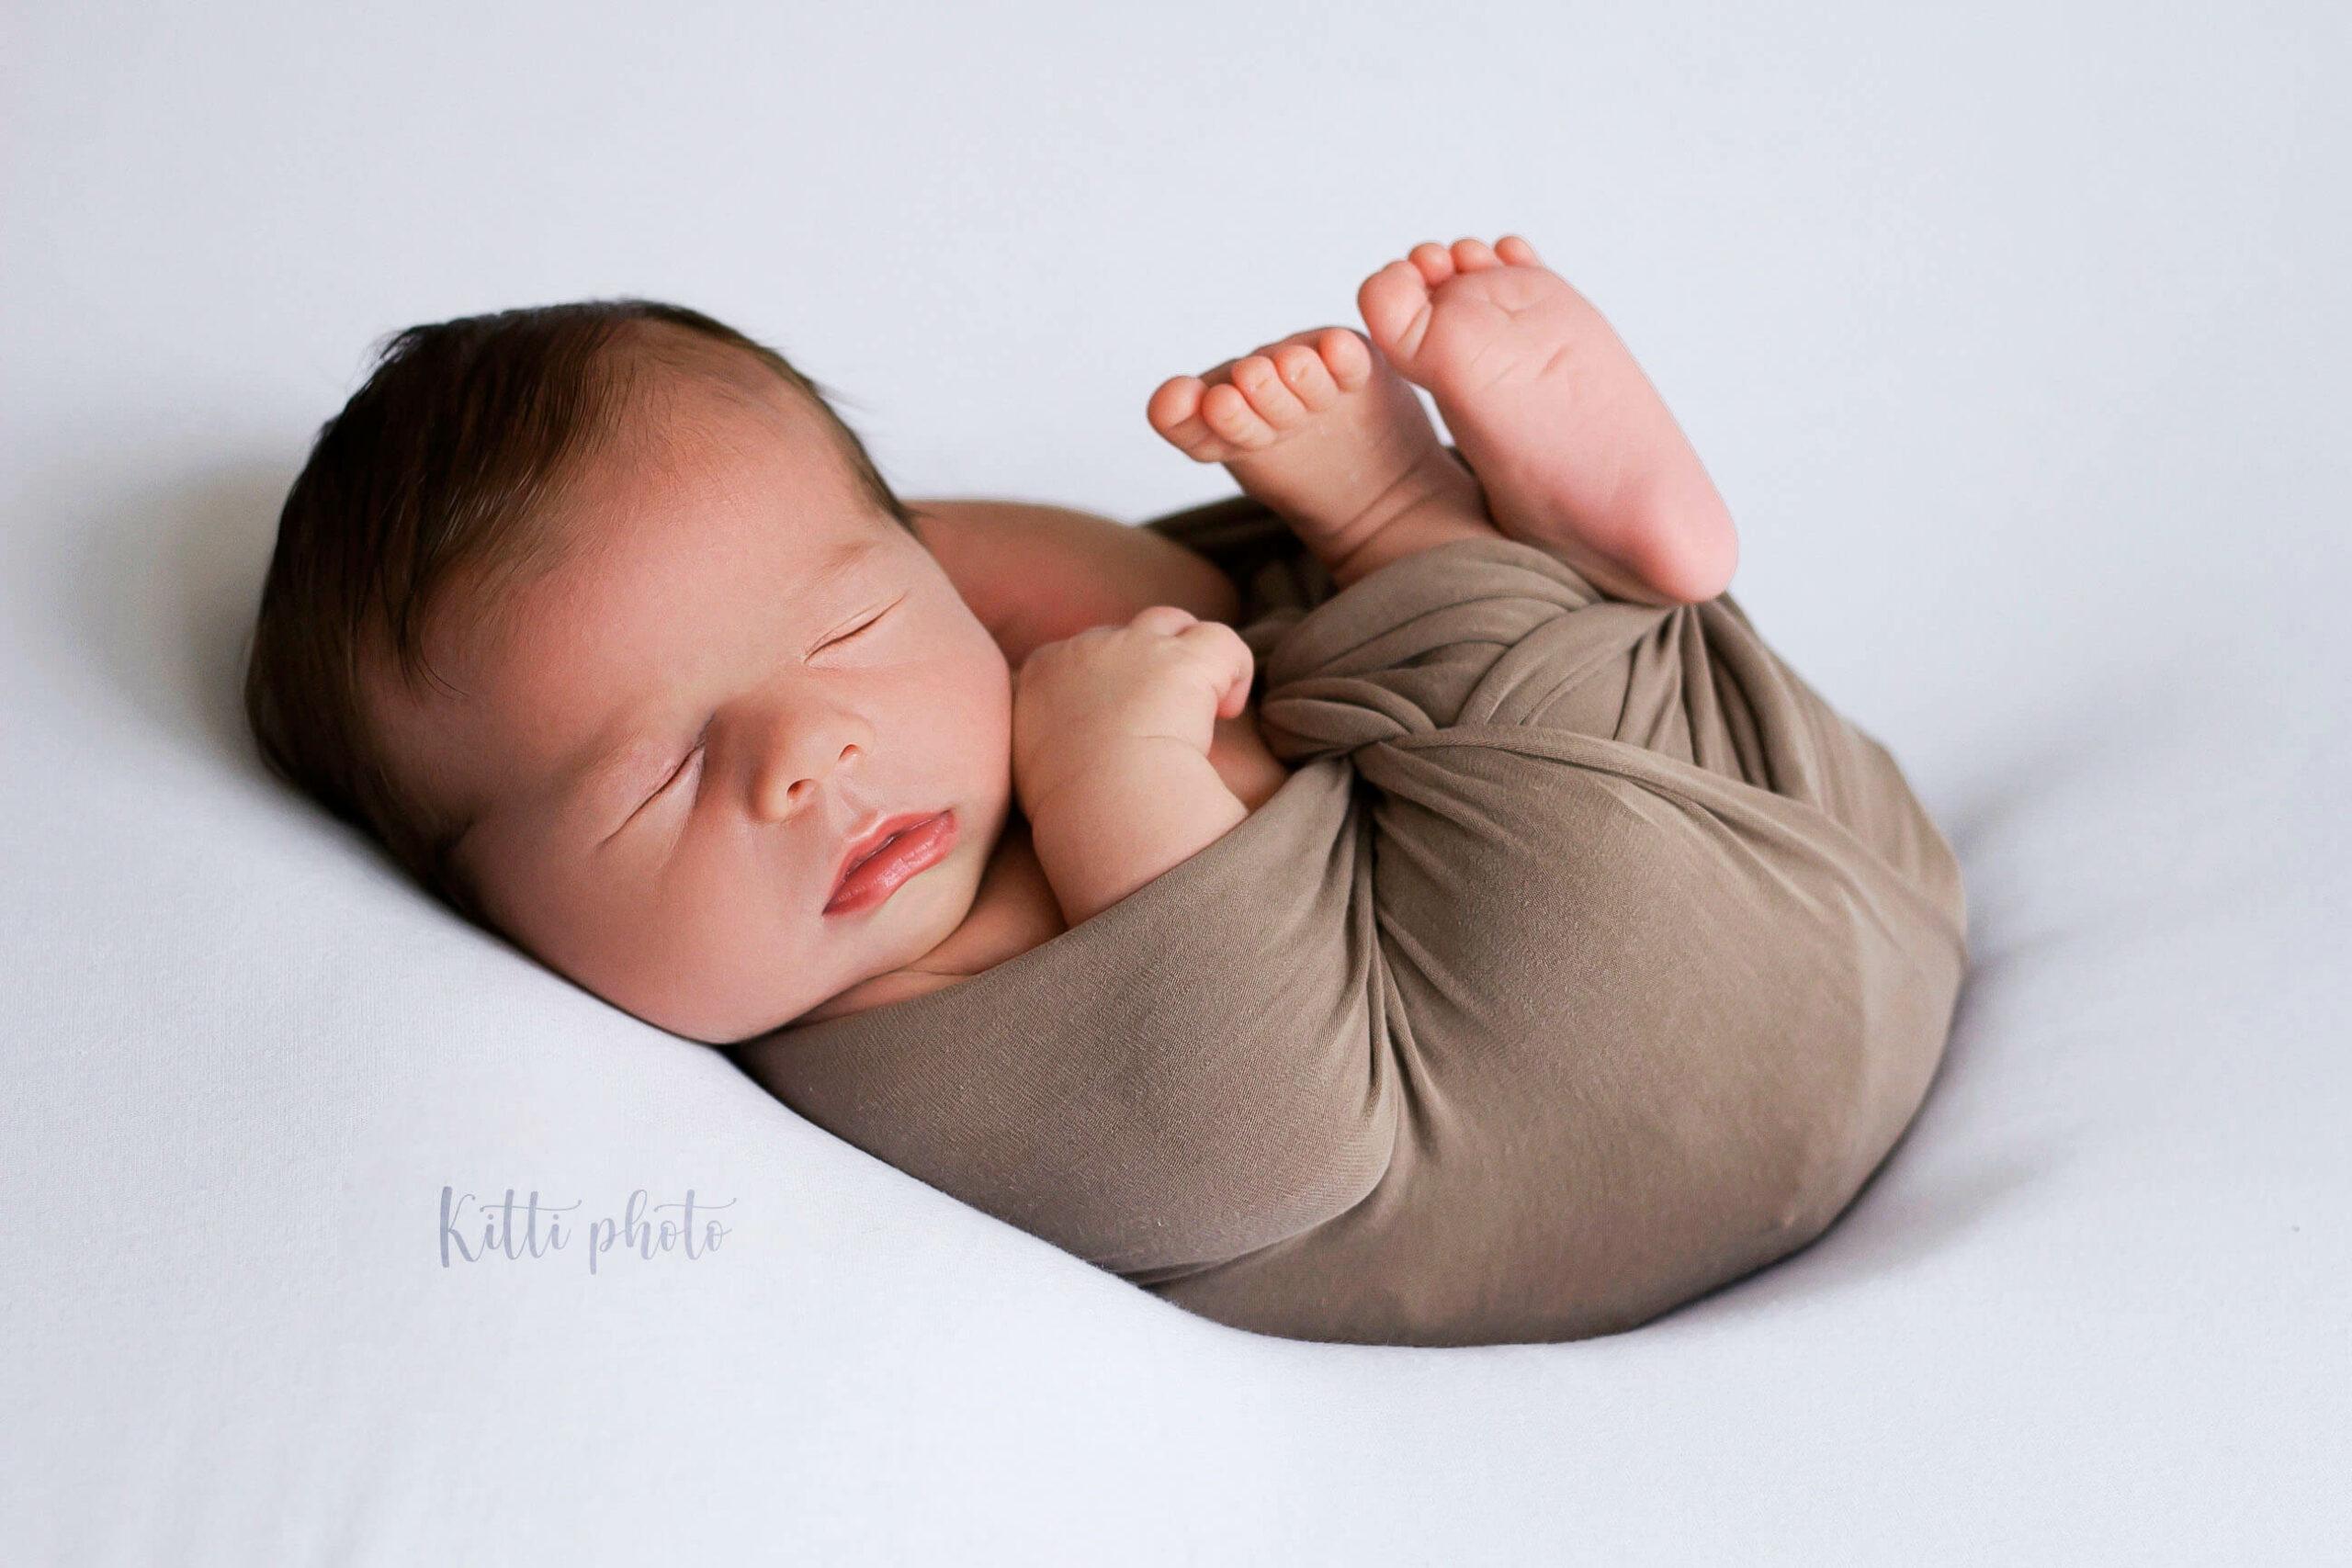 Fotografia novorodenca s bielym pozadím - Fotografka Nové Zámky - Kitti Photo